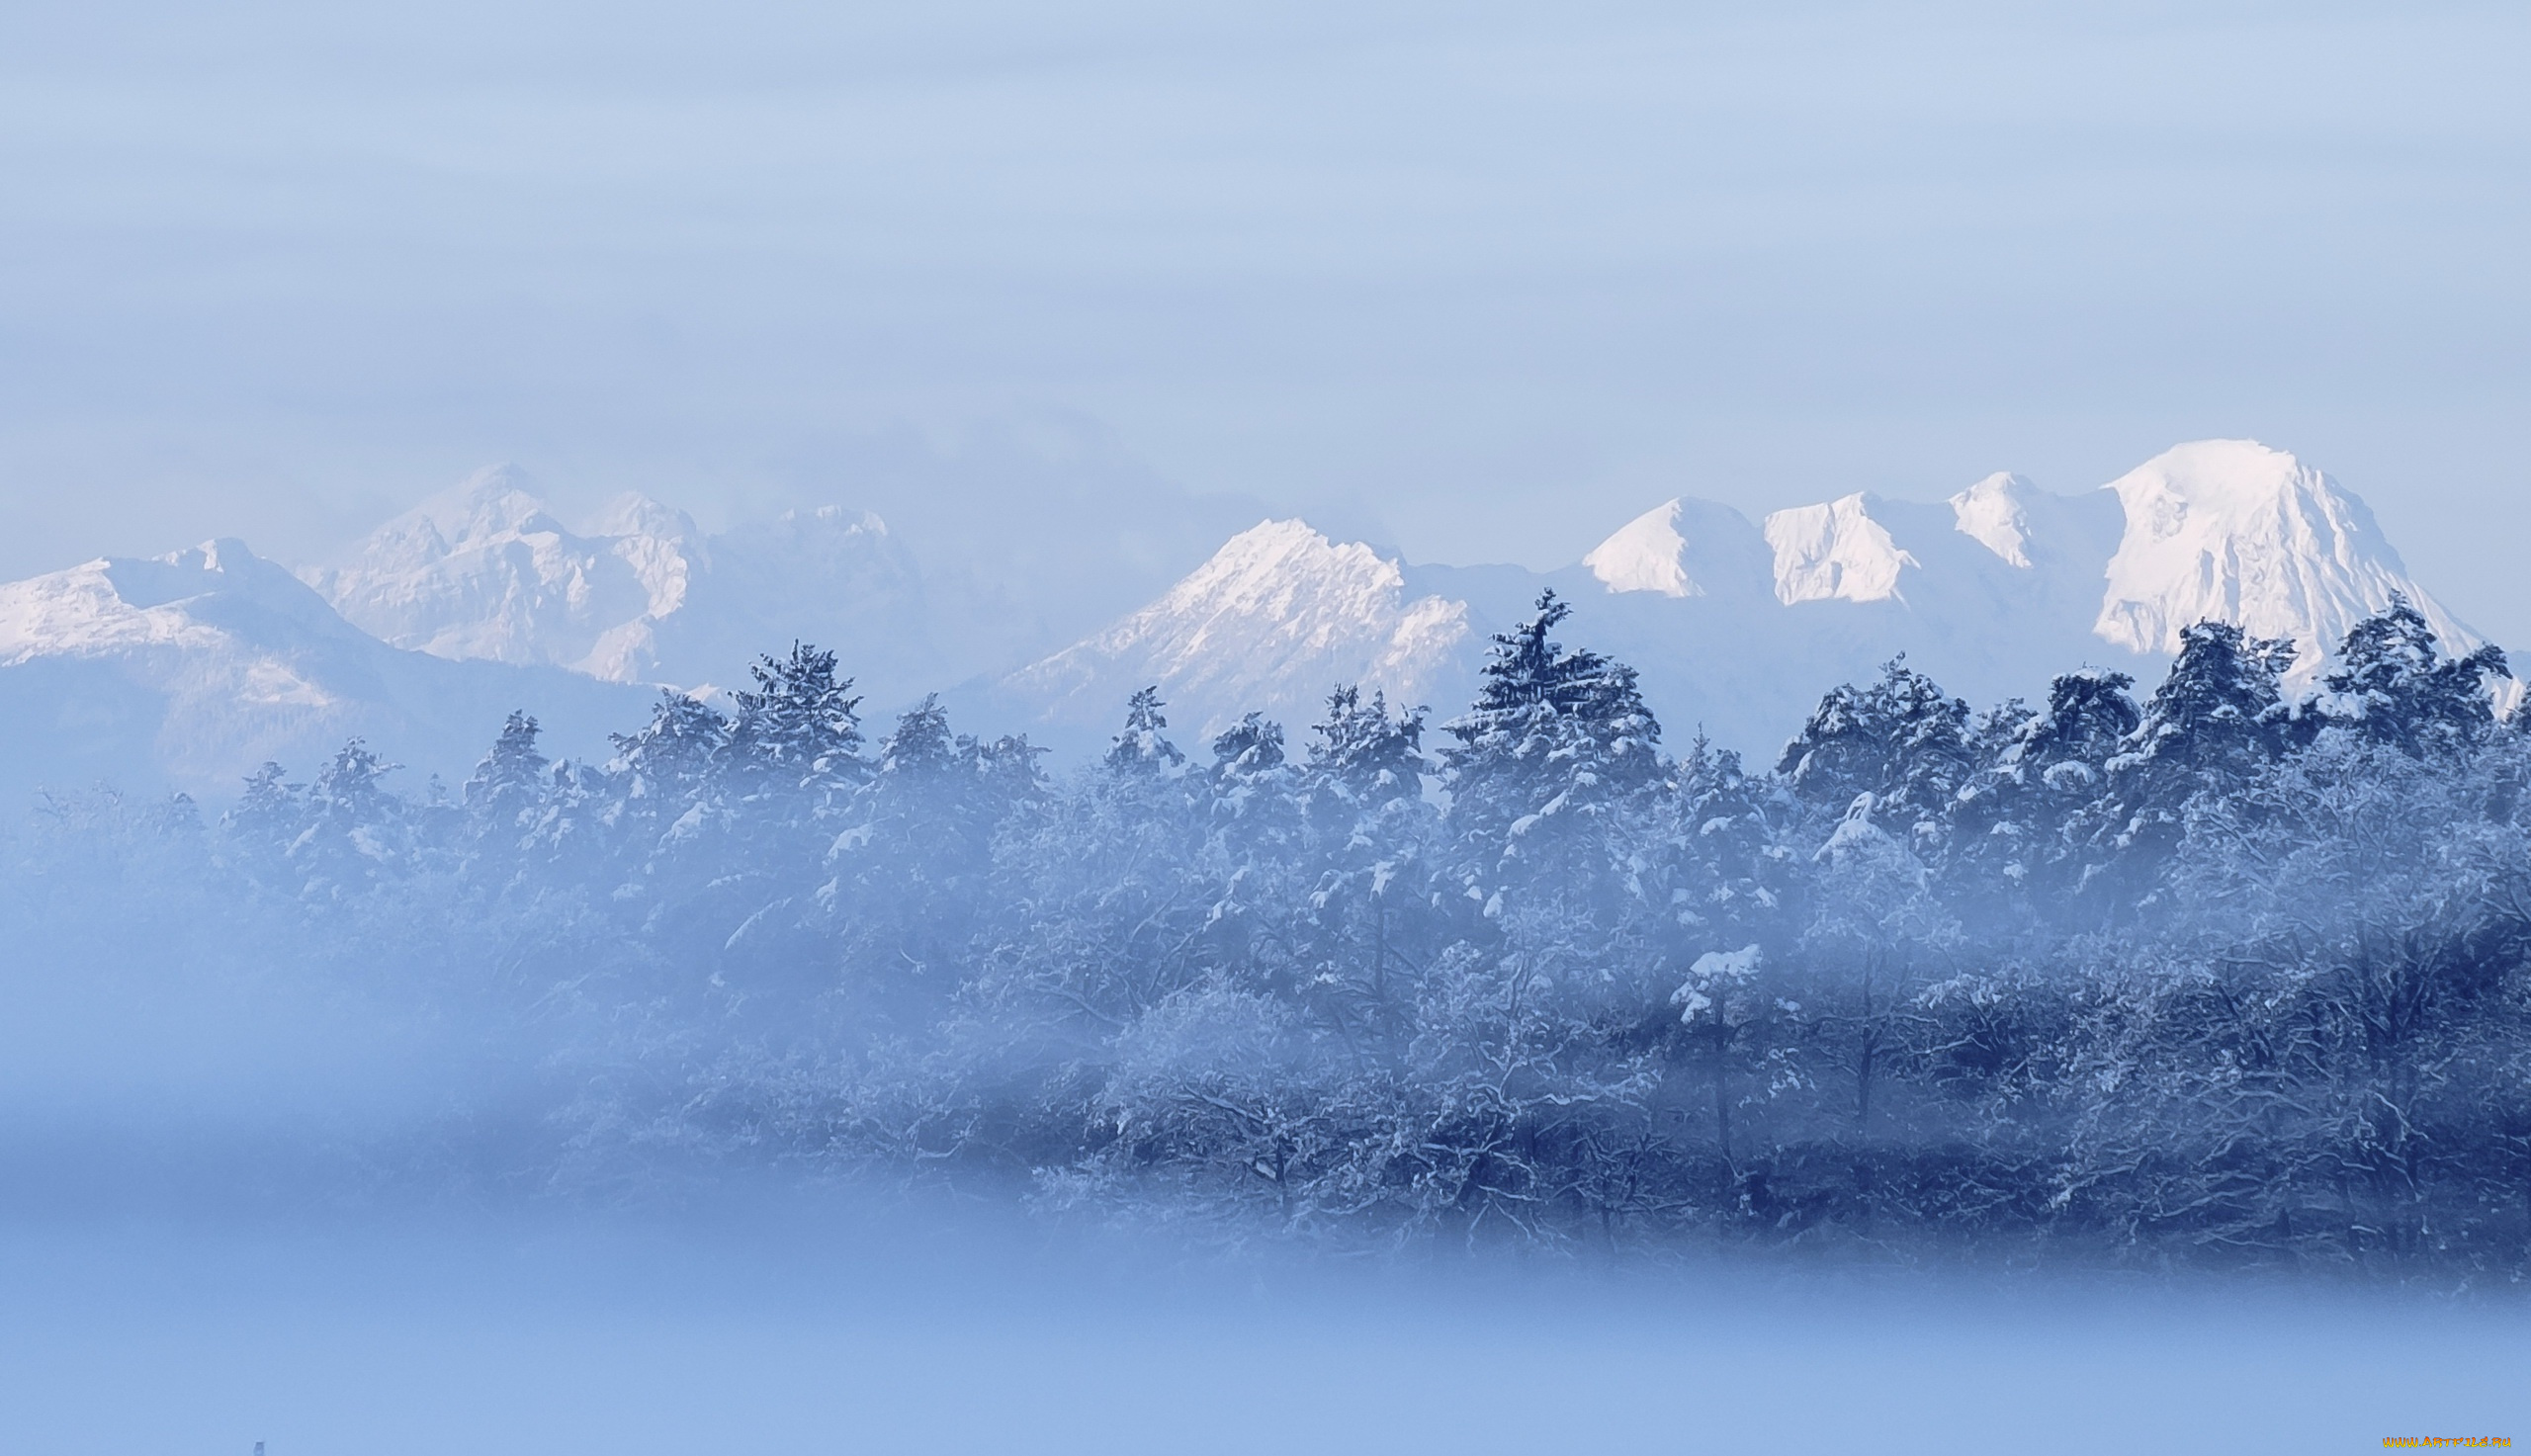 снег горы туман snow mountains fog  № 1146755 загрузить